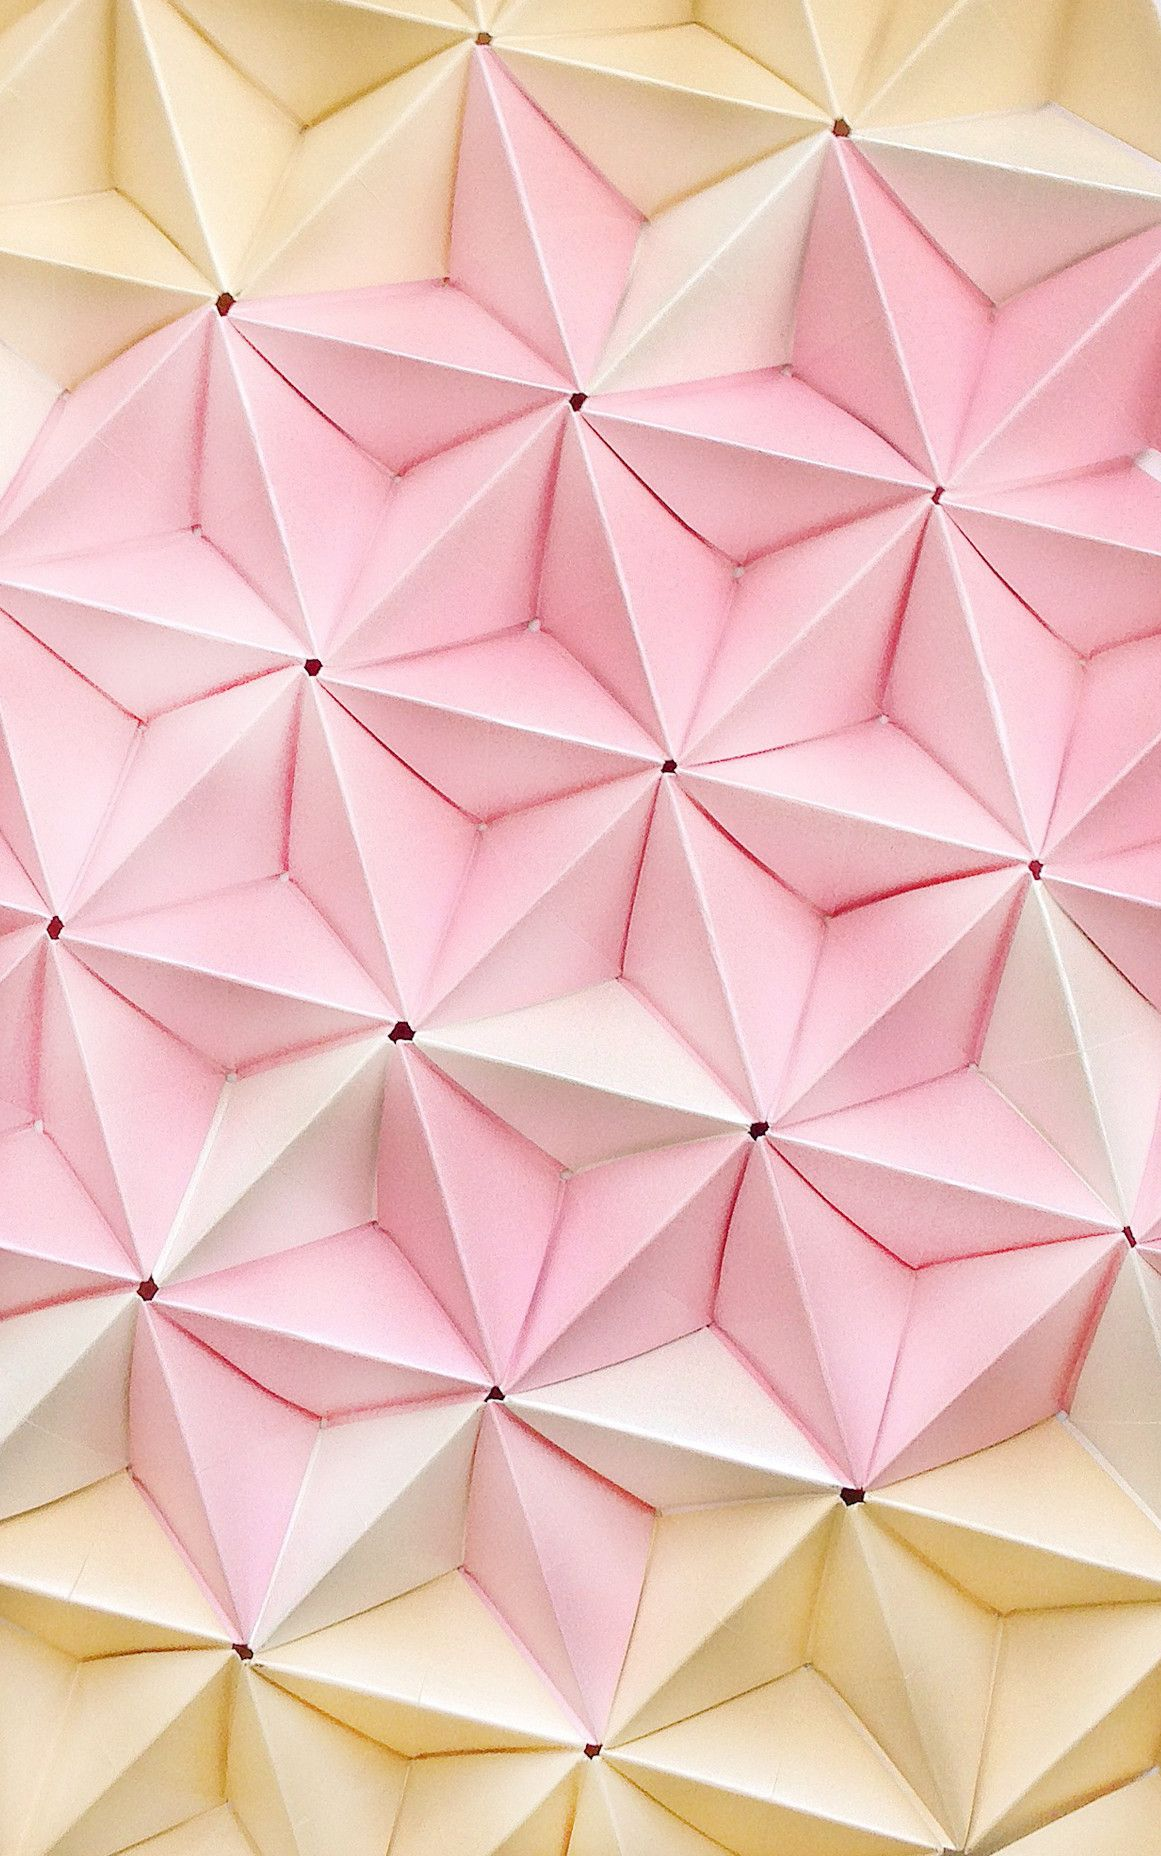 Origami In Pastel Casetify Iphone Art Design Cool Wallpaper Illustration Pastel Pink Cool Wallpaper Pink